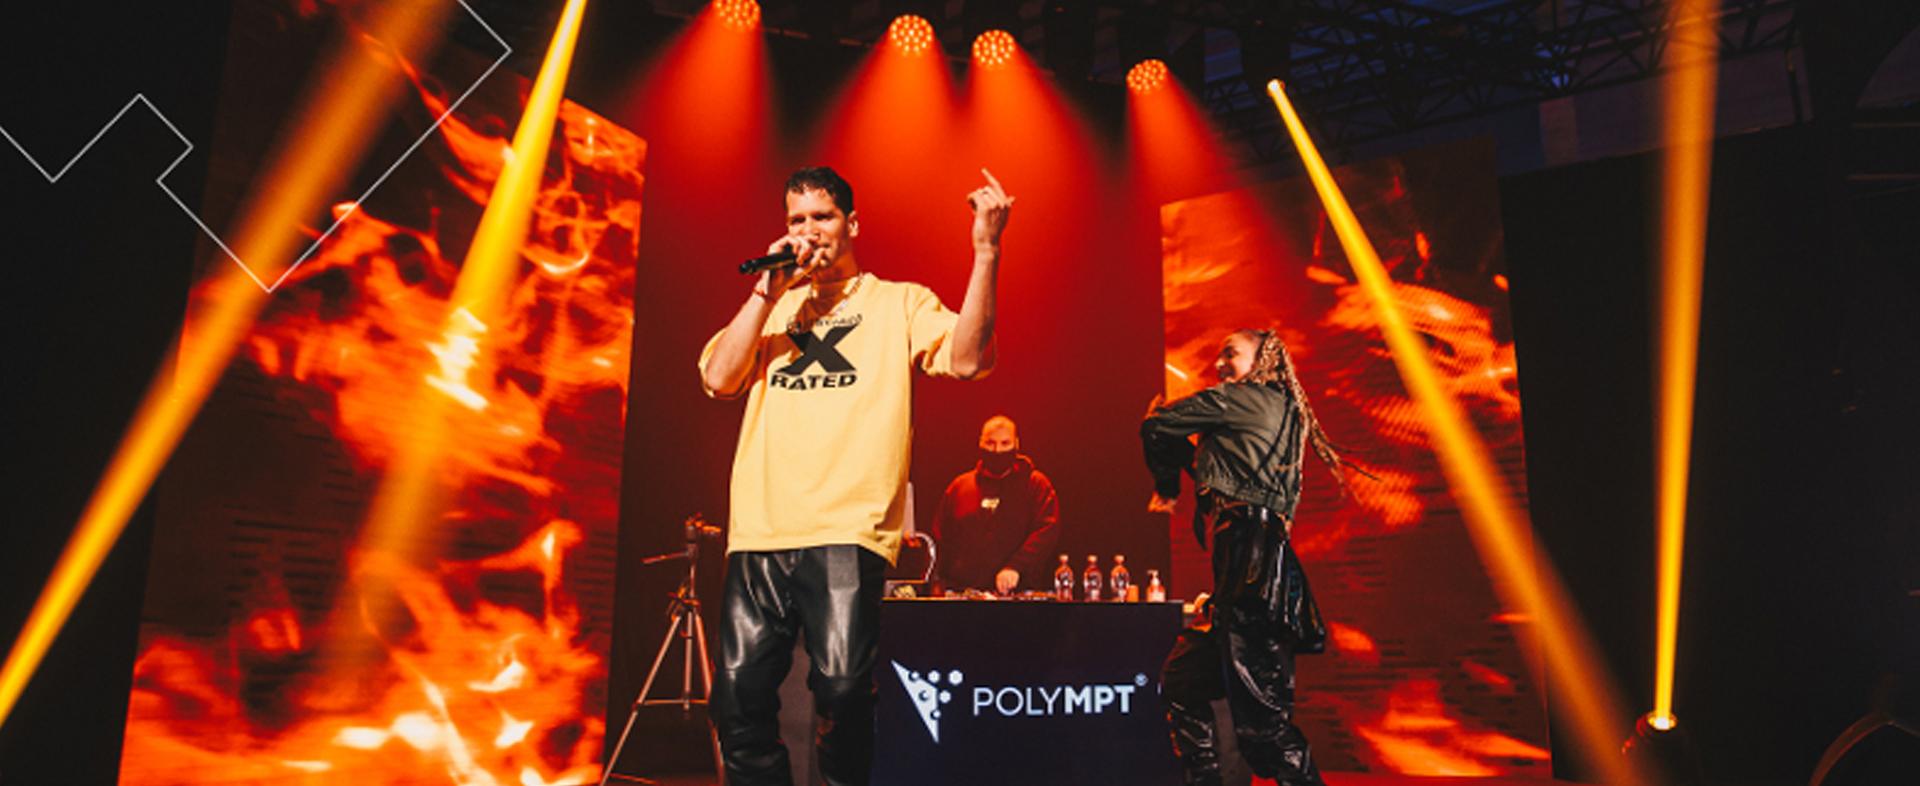 "Majk Spirit pokrstil album ""ARTIST"" počas online koncertu kanabidiolom (CBD)."